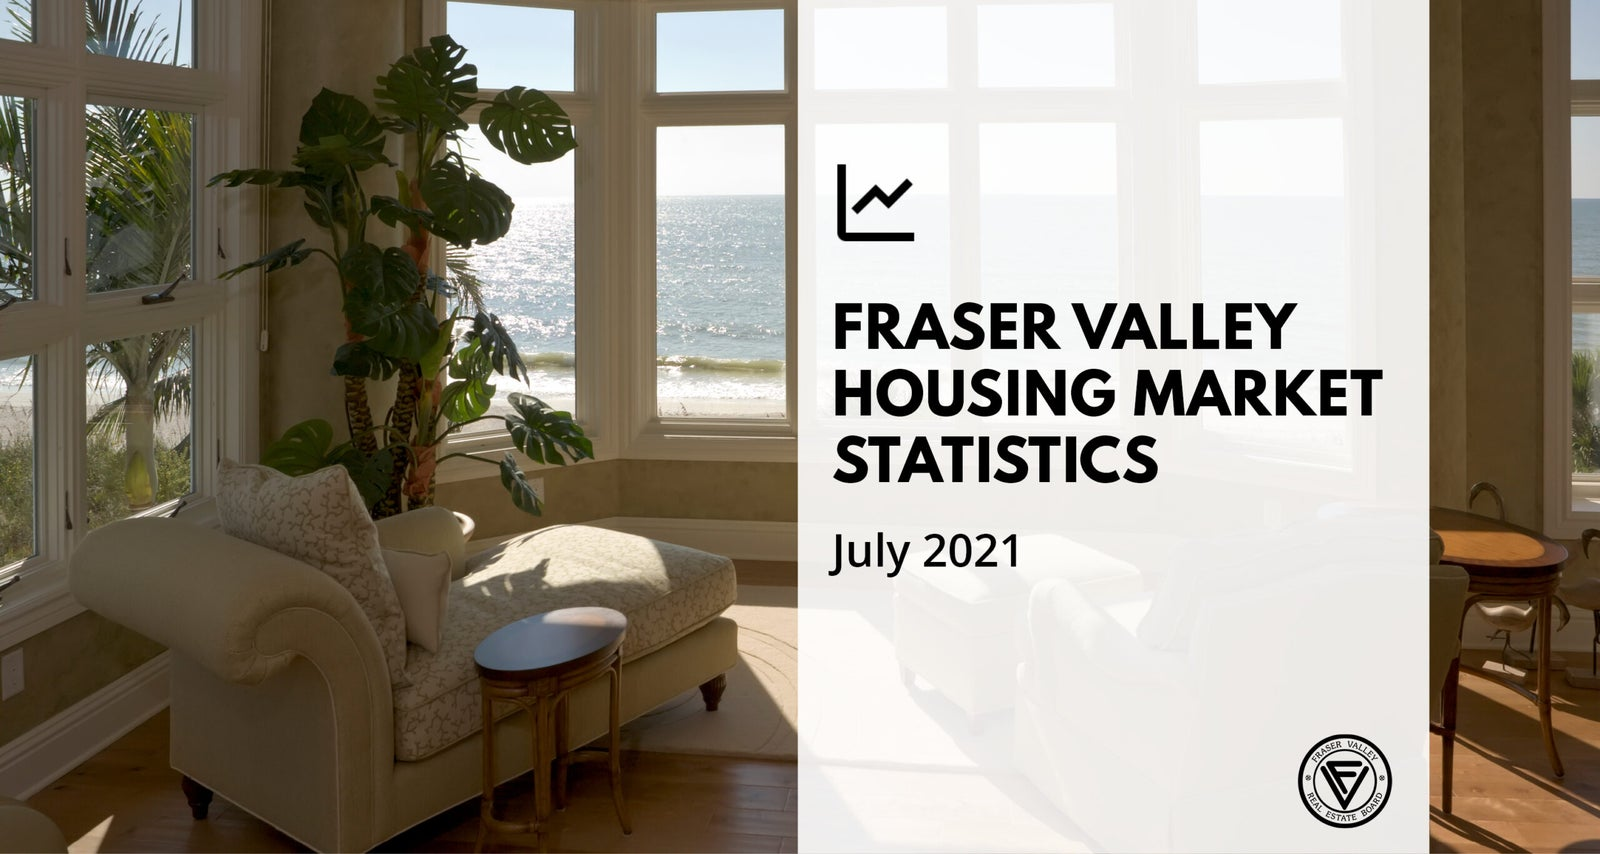 Fraser Valley Housing Market Statistics July 2021